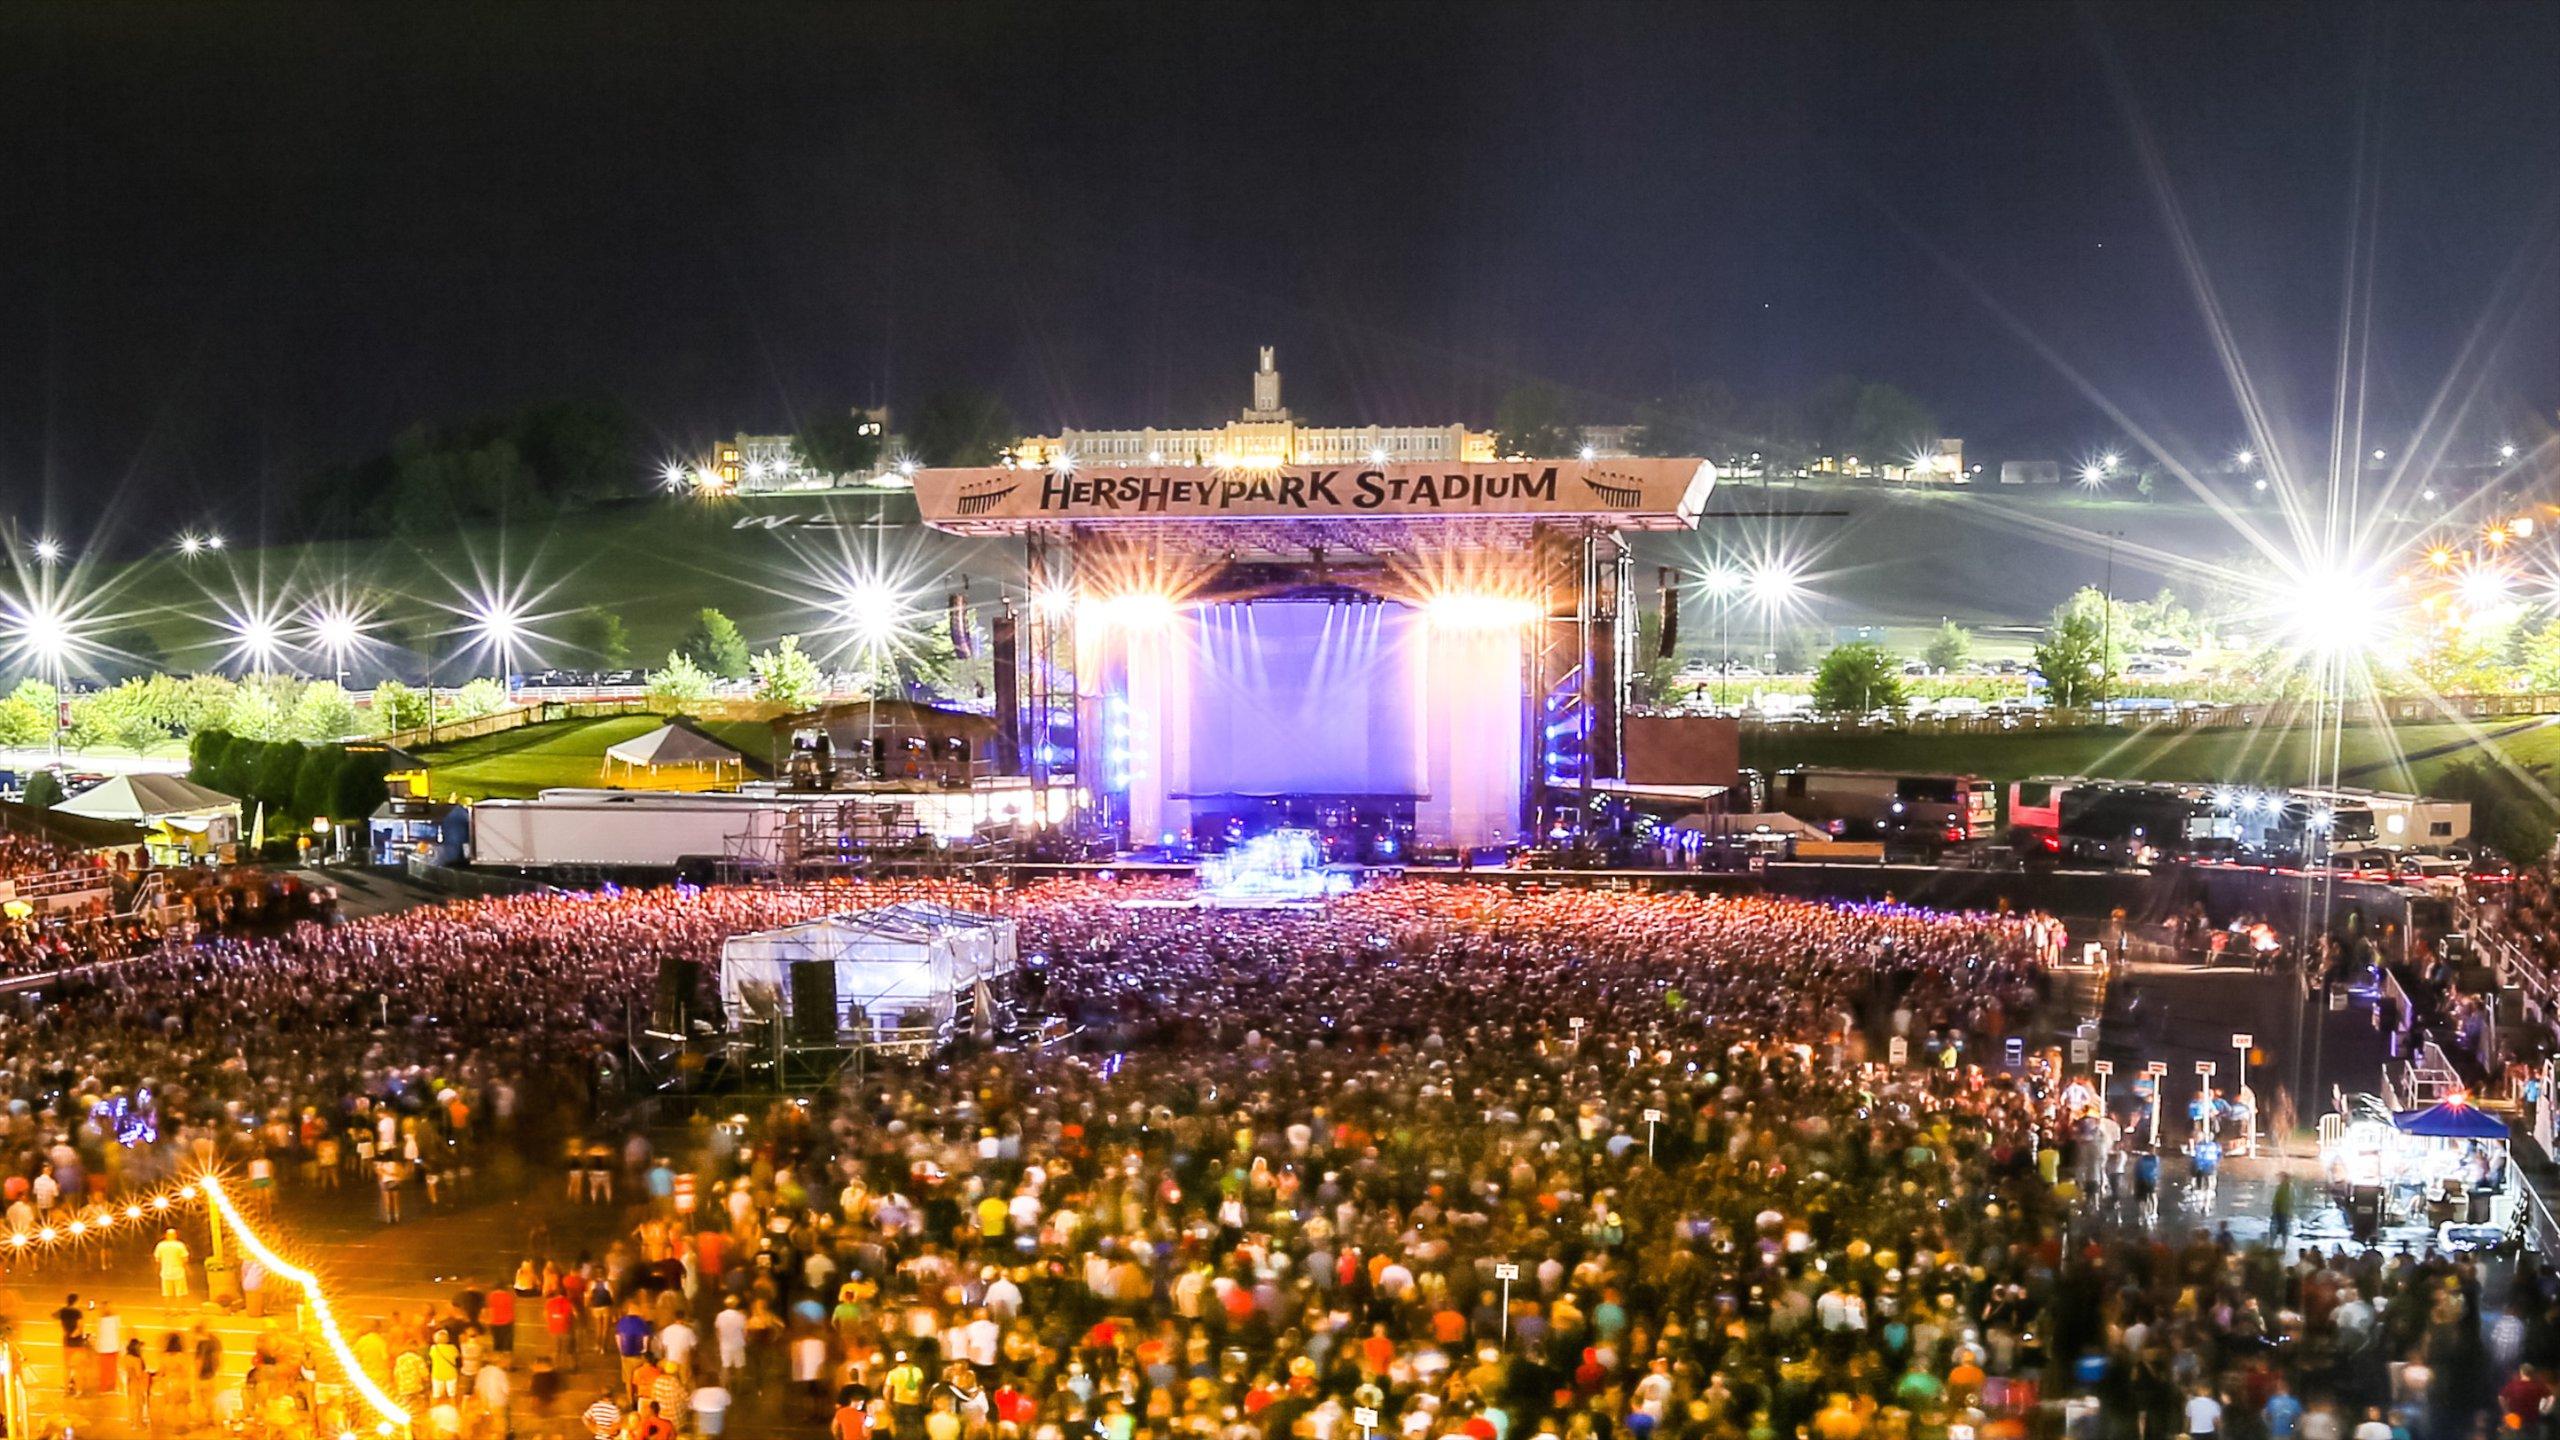 Hersheypark Stadium, Hershey, Pennsylvania, United States of America